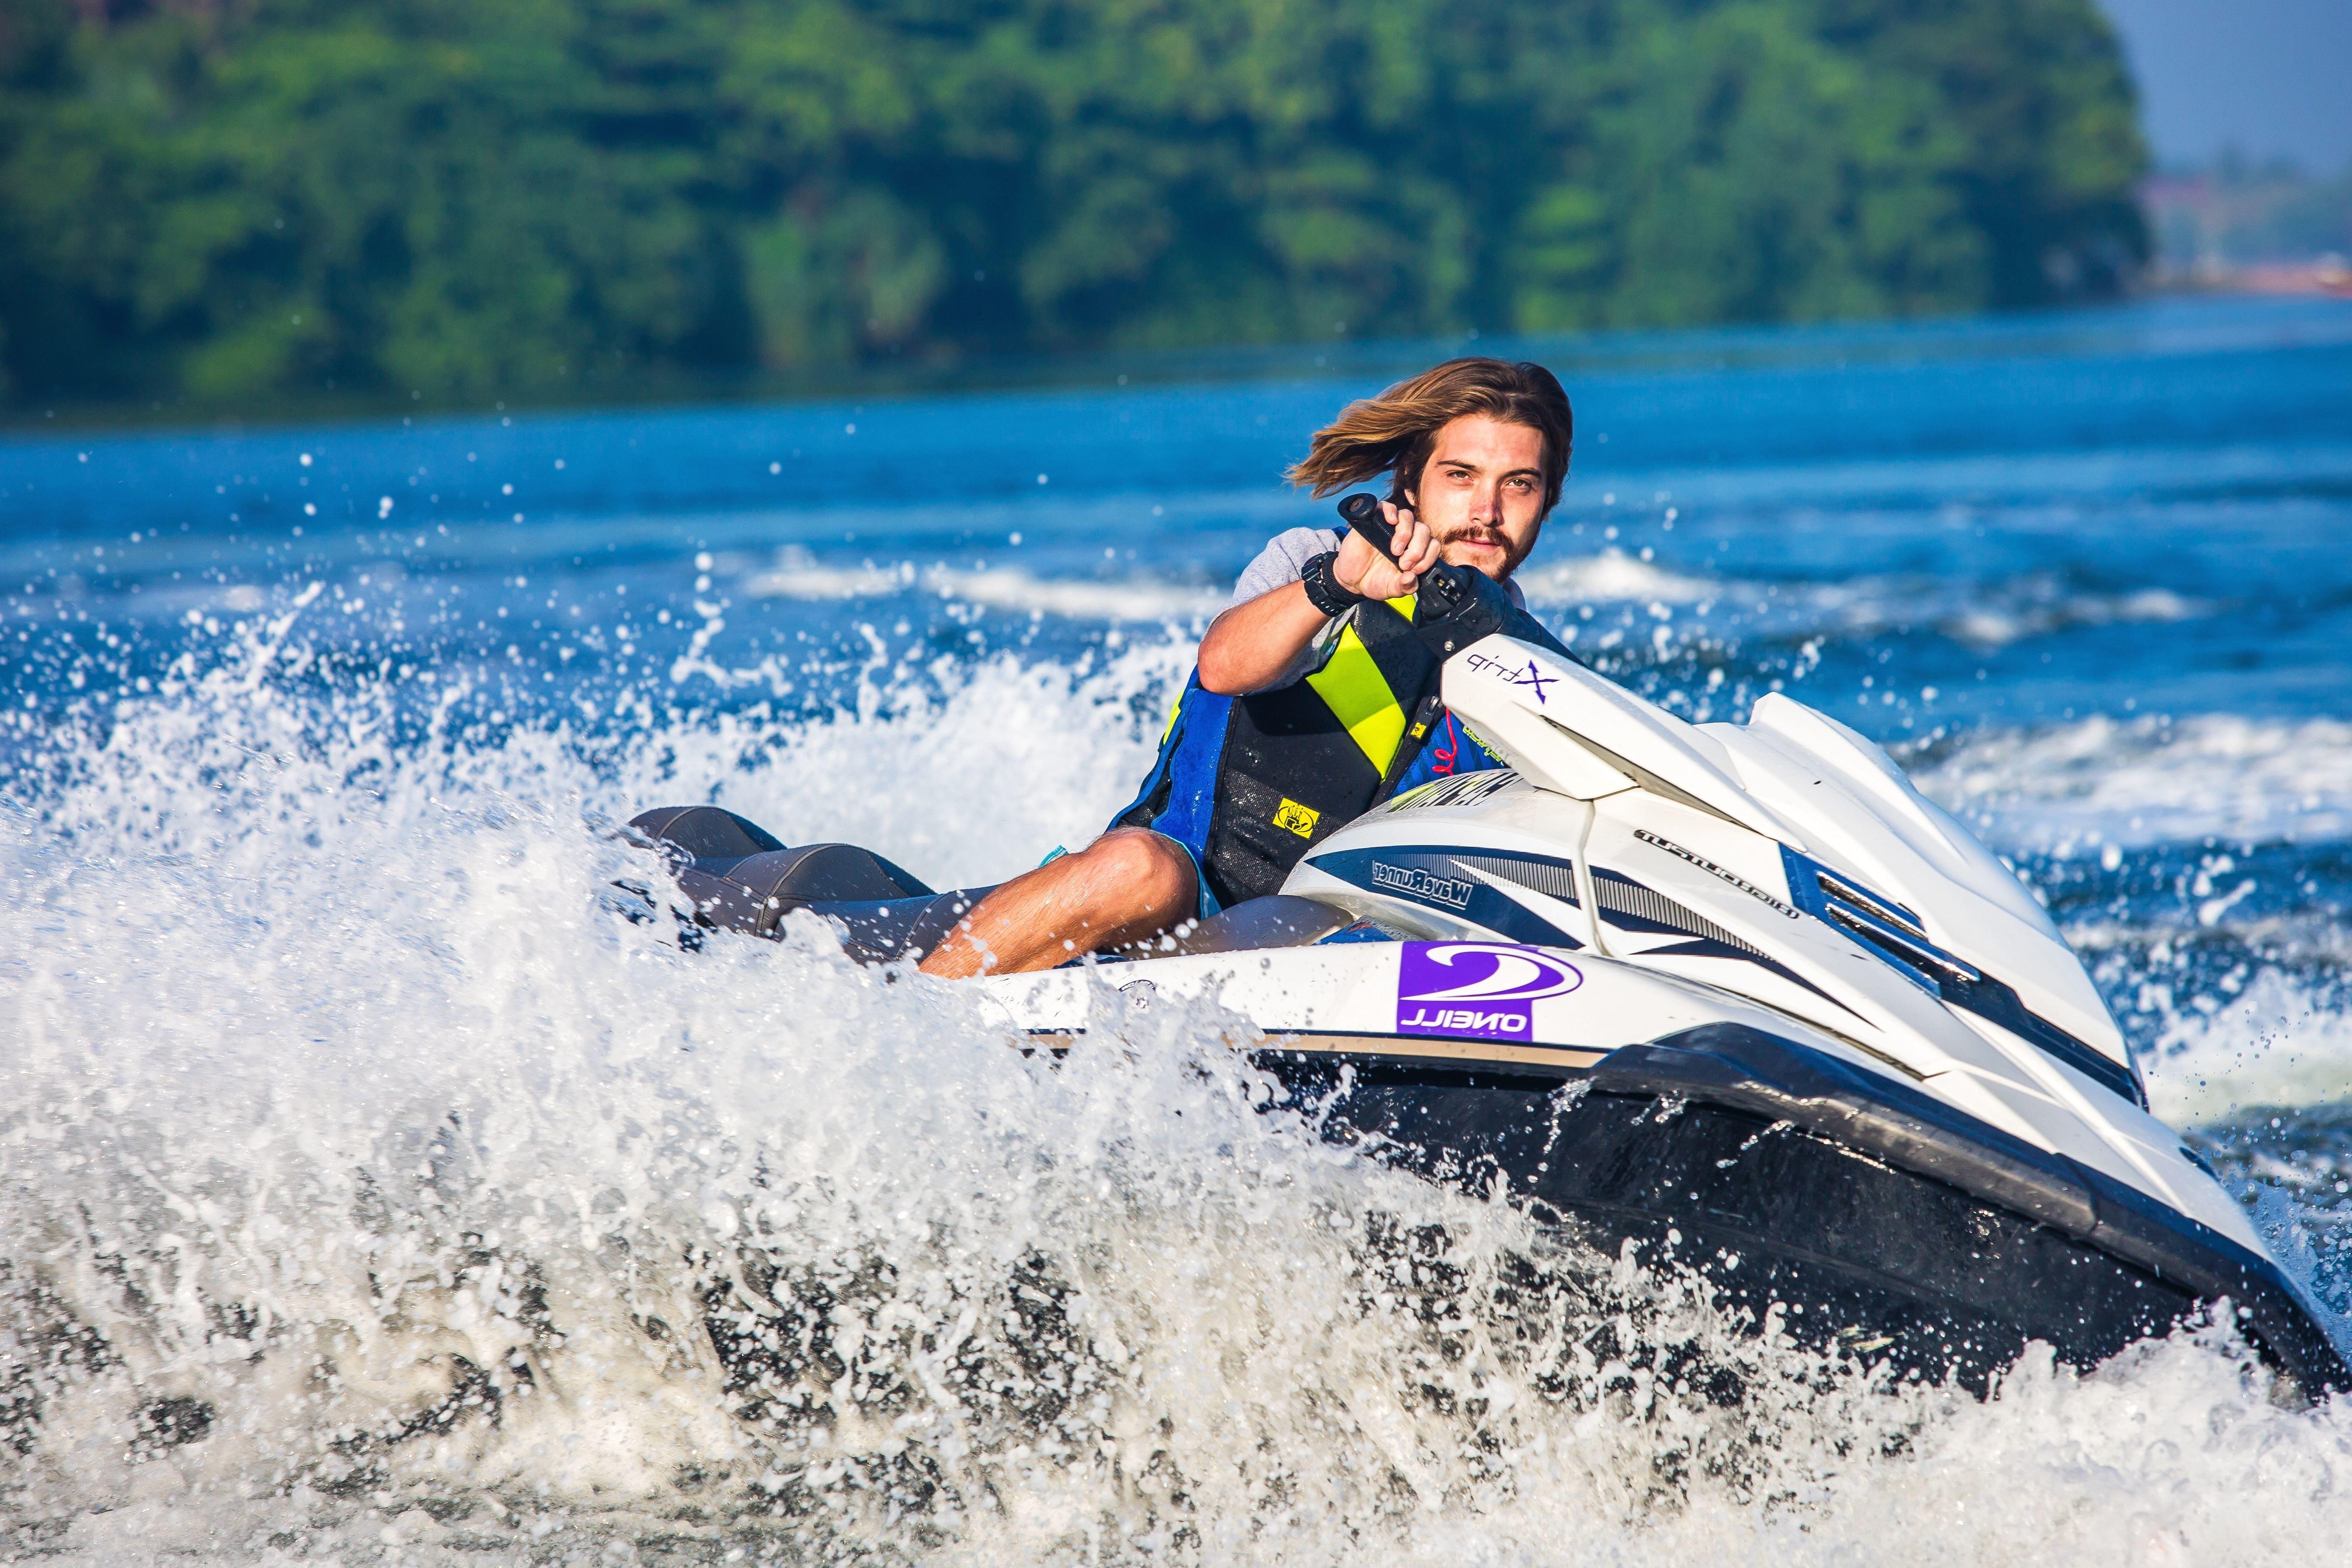 Free picture: watercraft, waves, splash, sport, jet ski ...